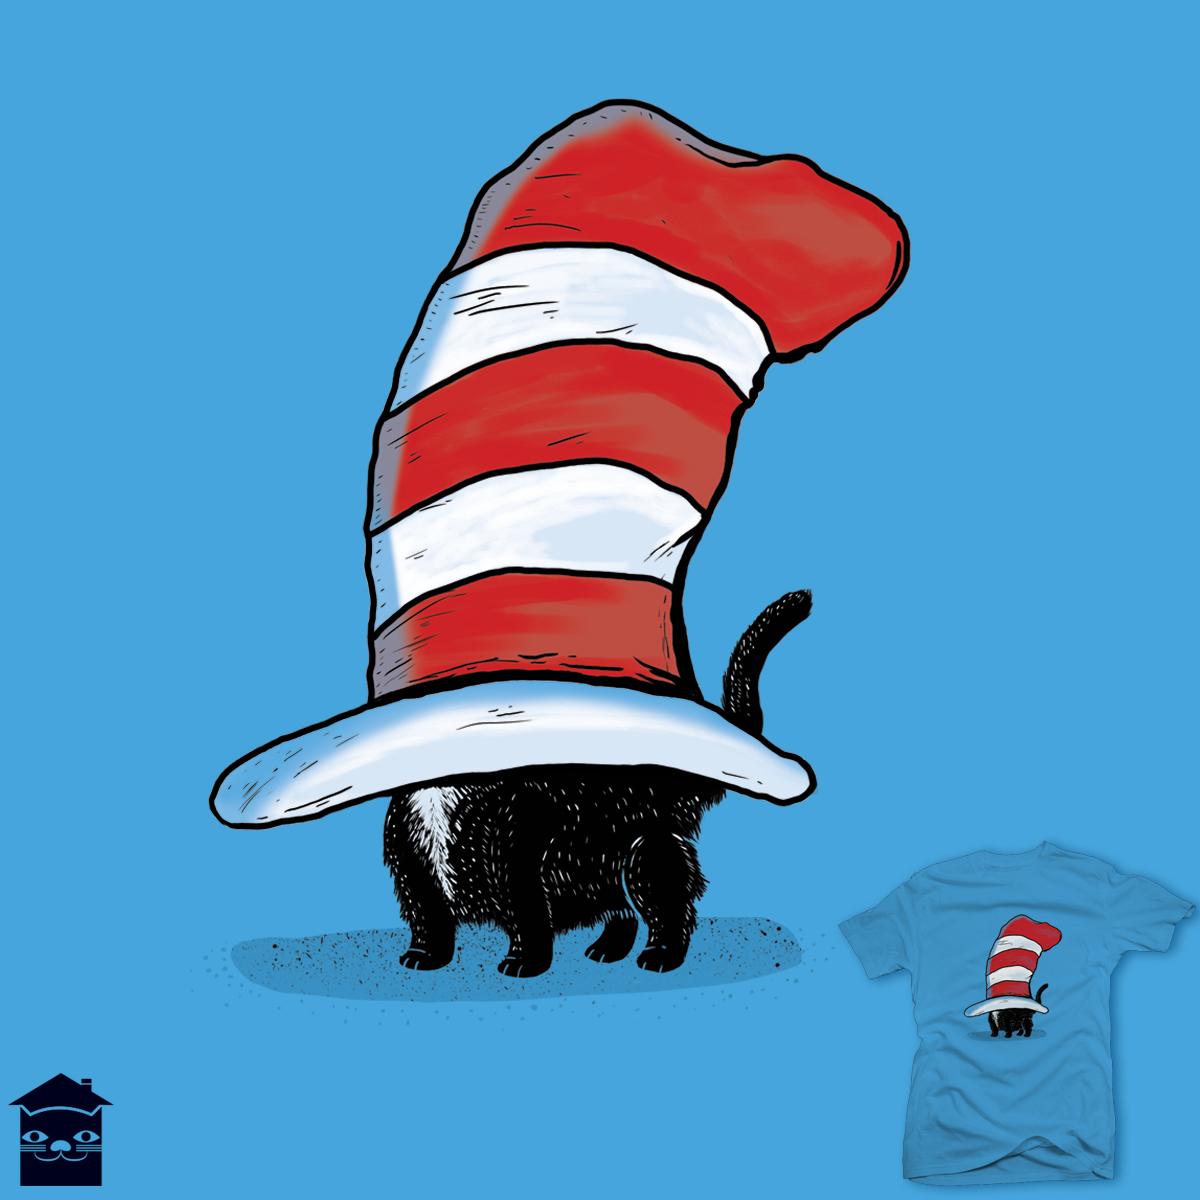 HAT CAT by JIMDAHOUSECAT on Threadless